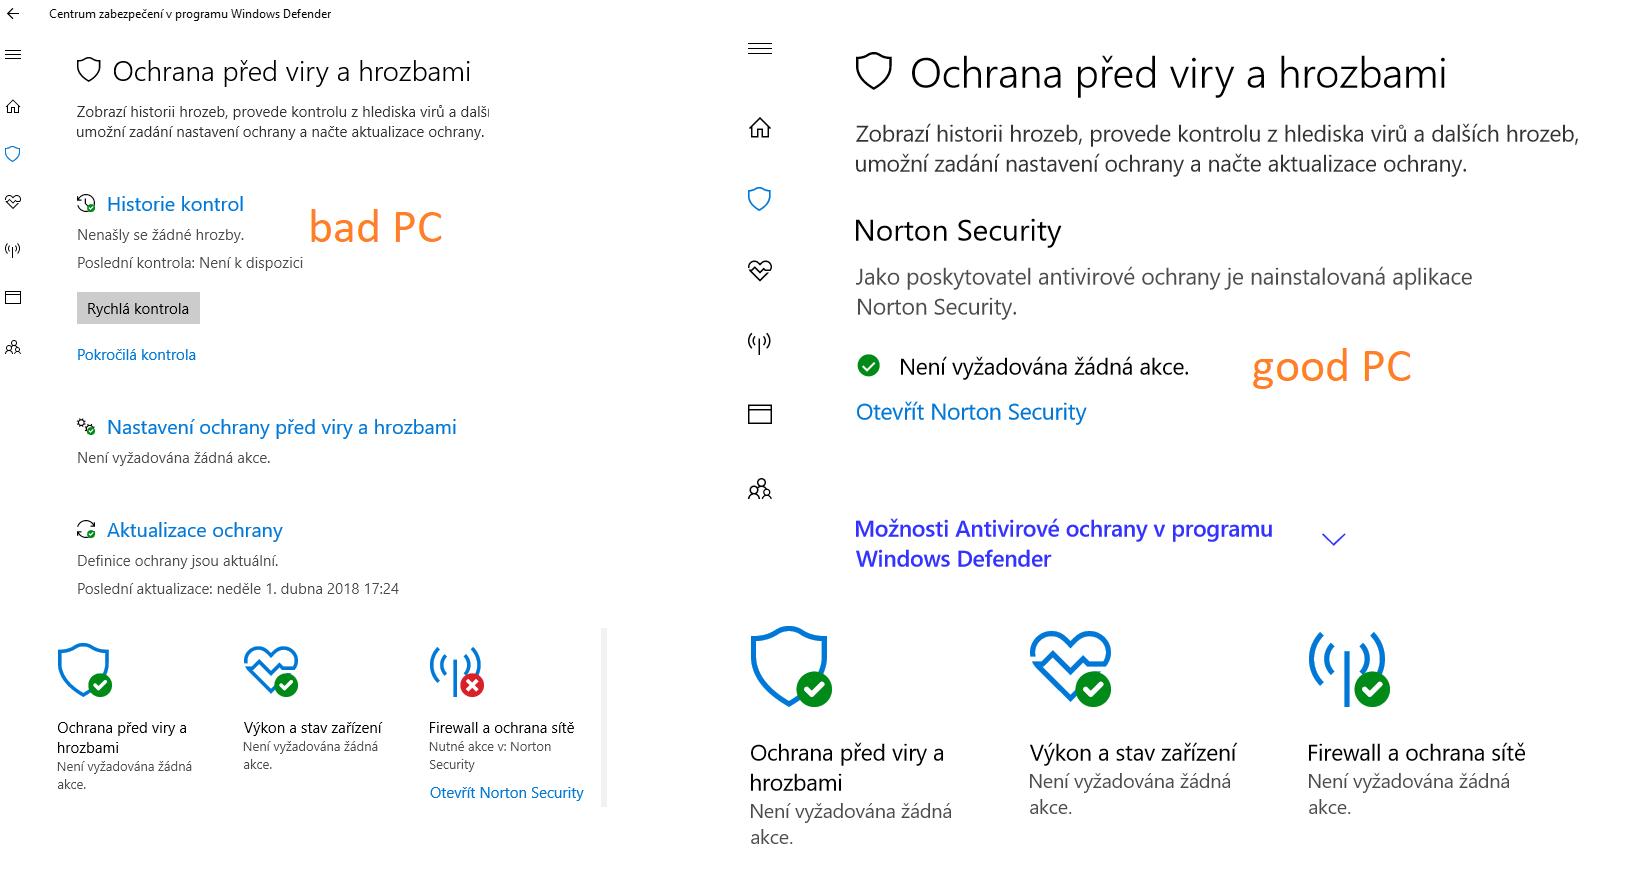 Windows defender still active | Norton Community